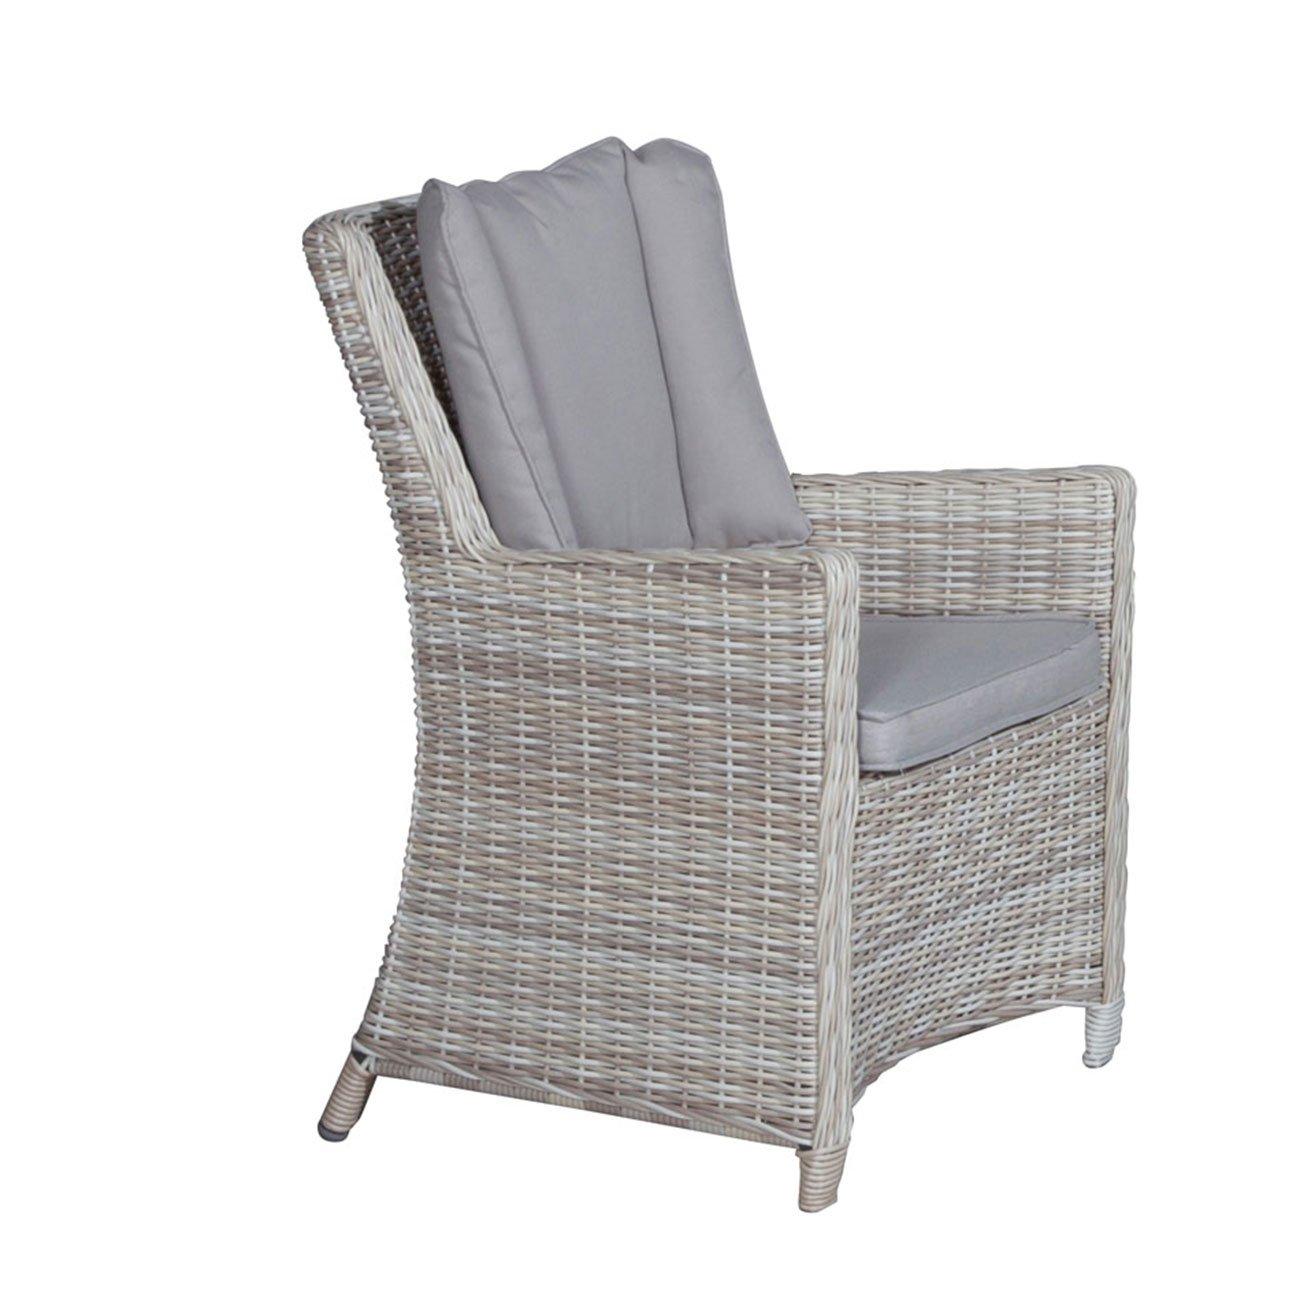 gartenstuhl outliv almaty diningsessel geflecht passion willow sand stuhl garten g nstig kaufen. Black Bedroom Furniture Sets. Home Design Ideas